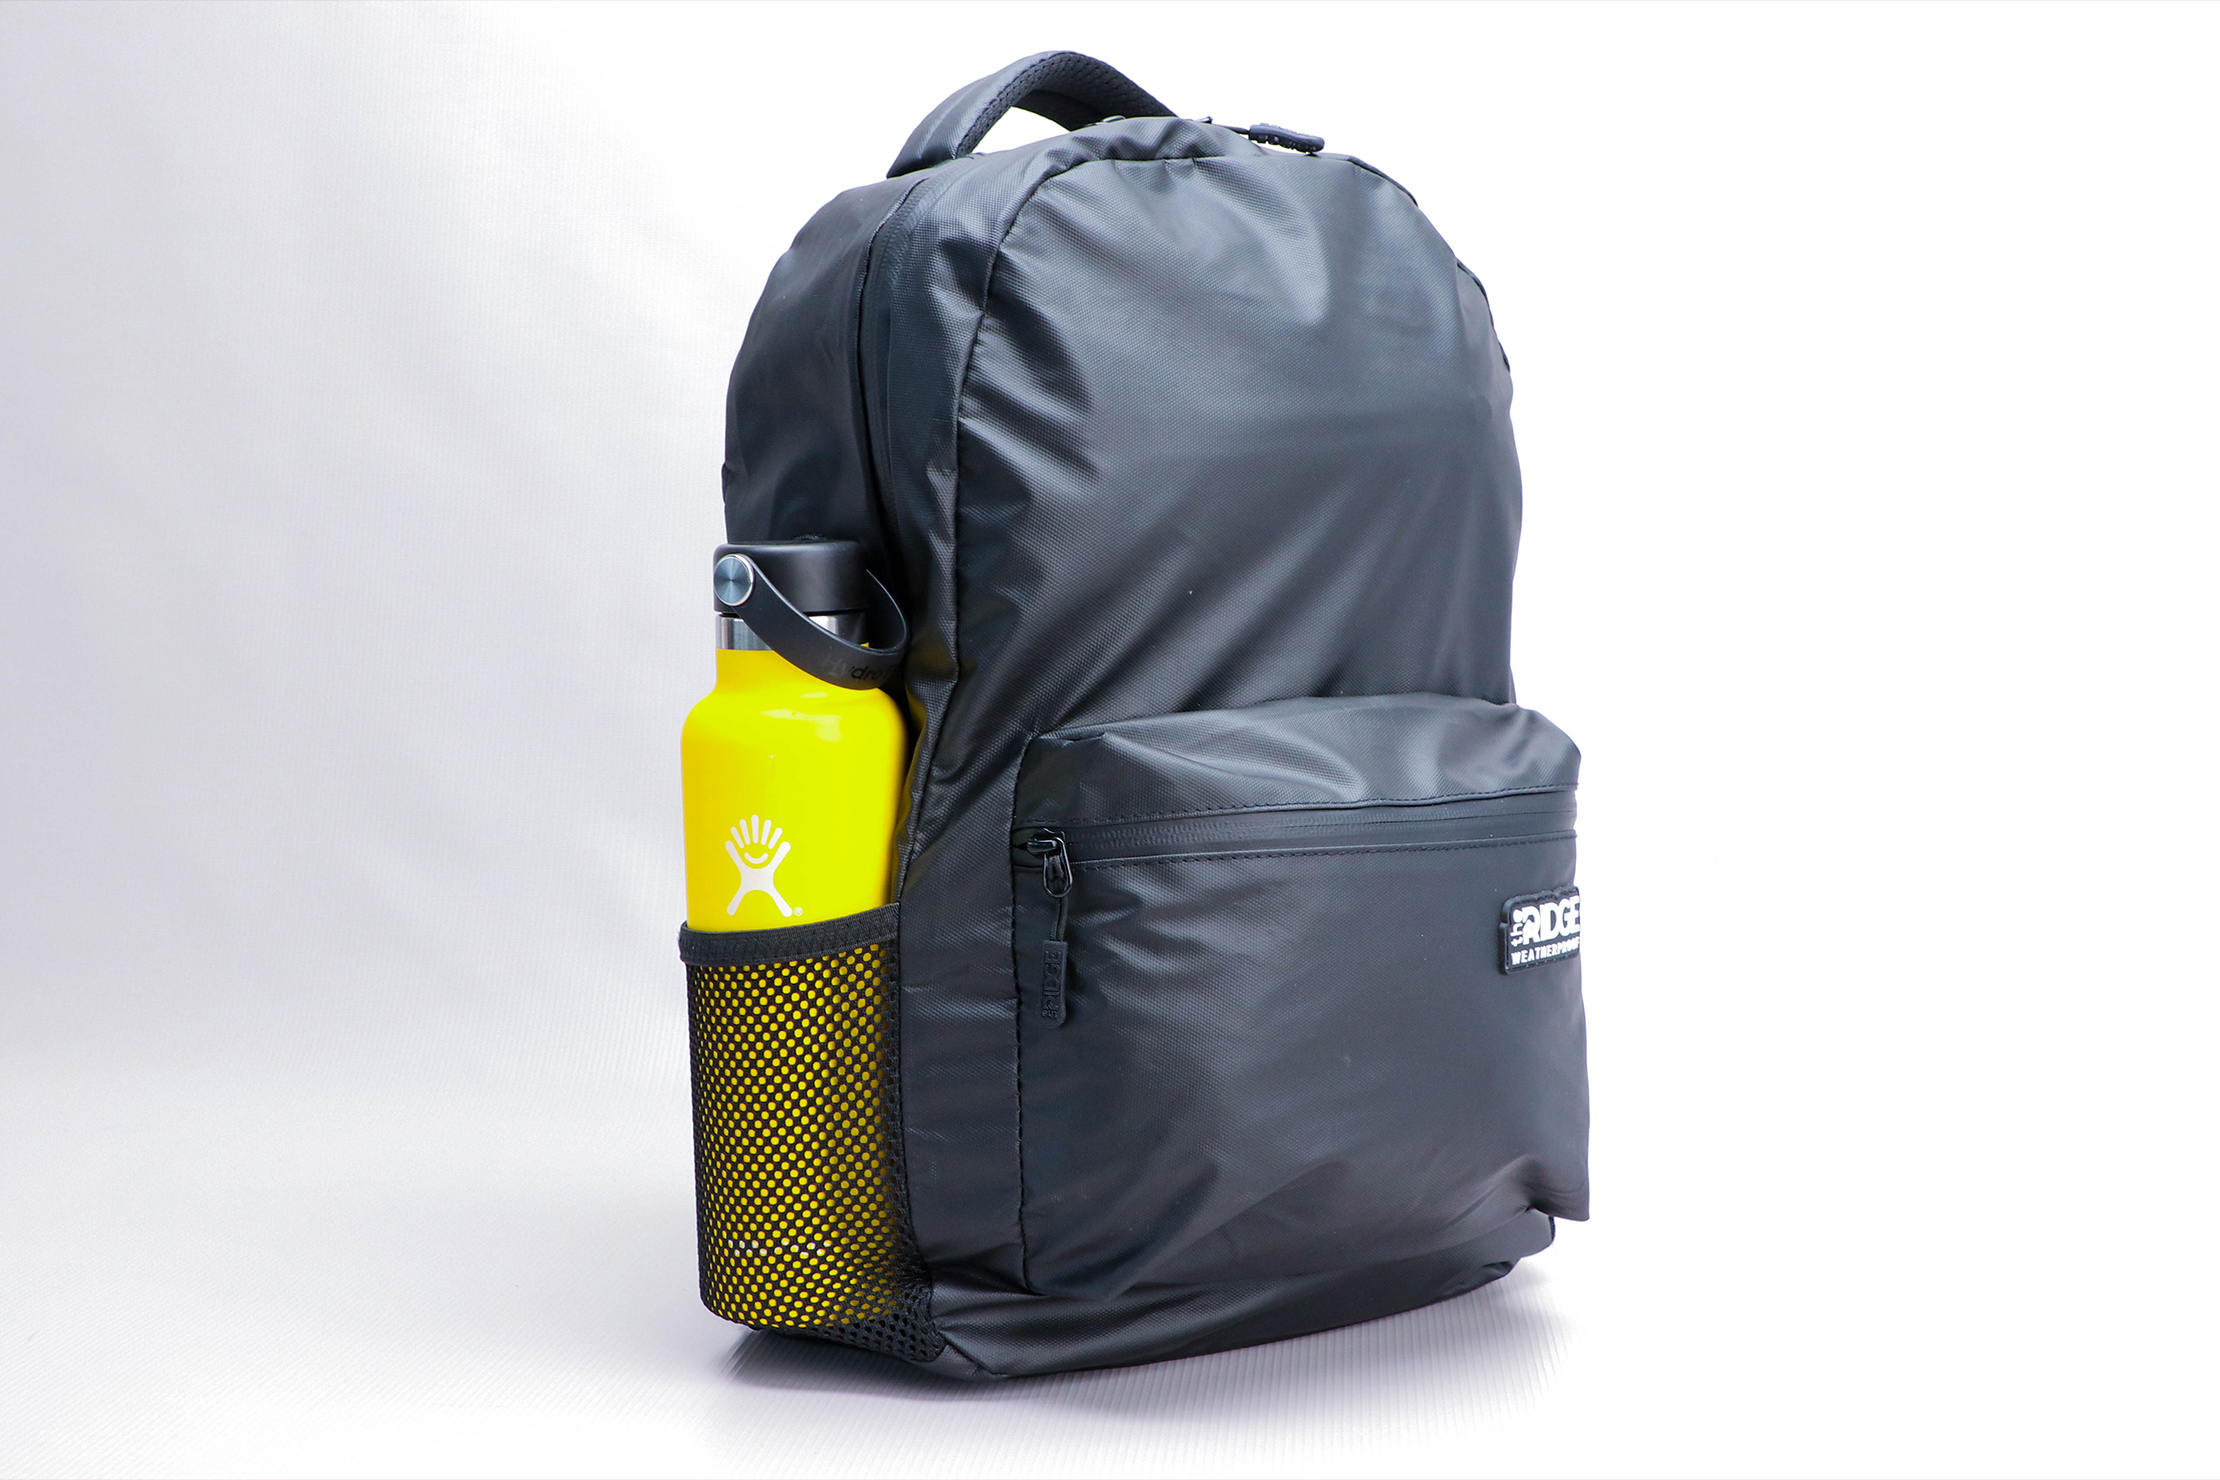 The Ridge Classic Backpack Weatherproof Side Pocket